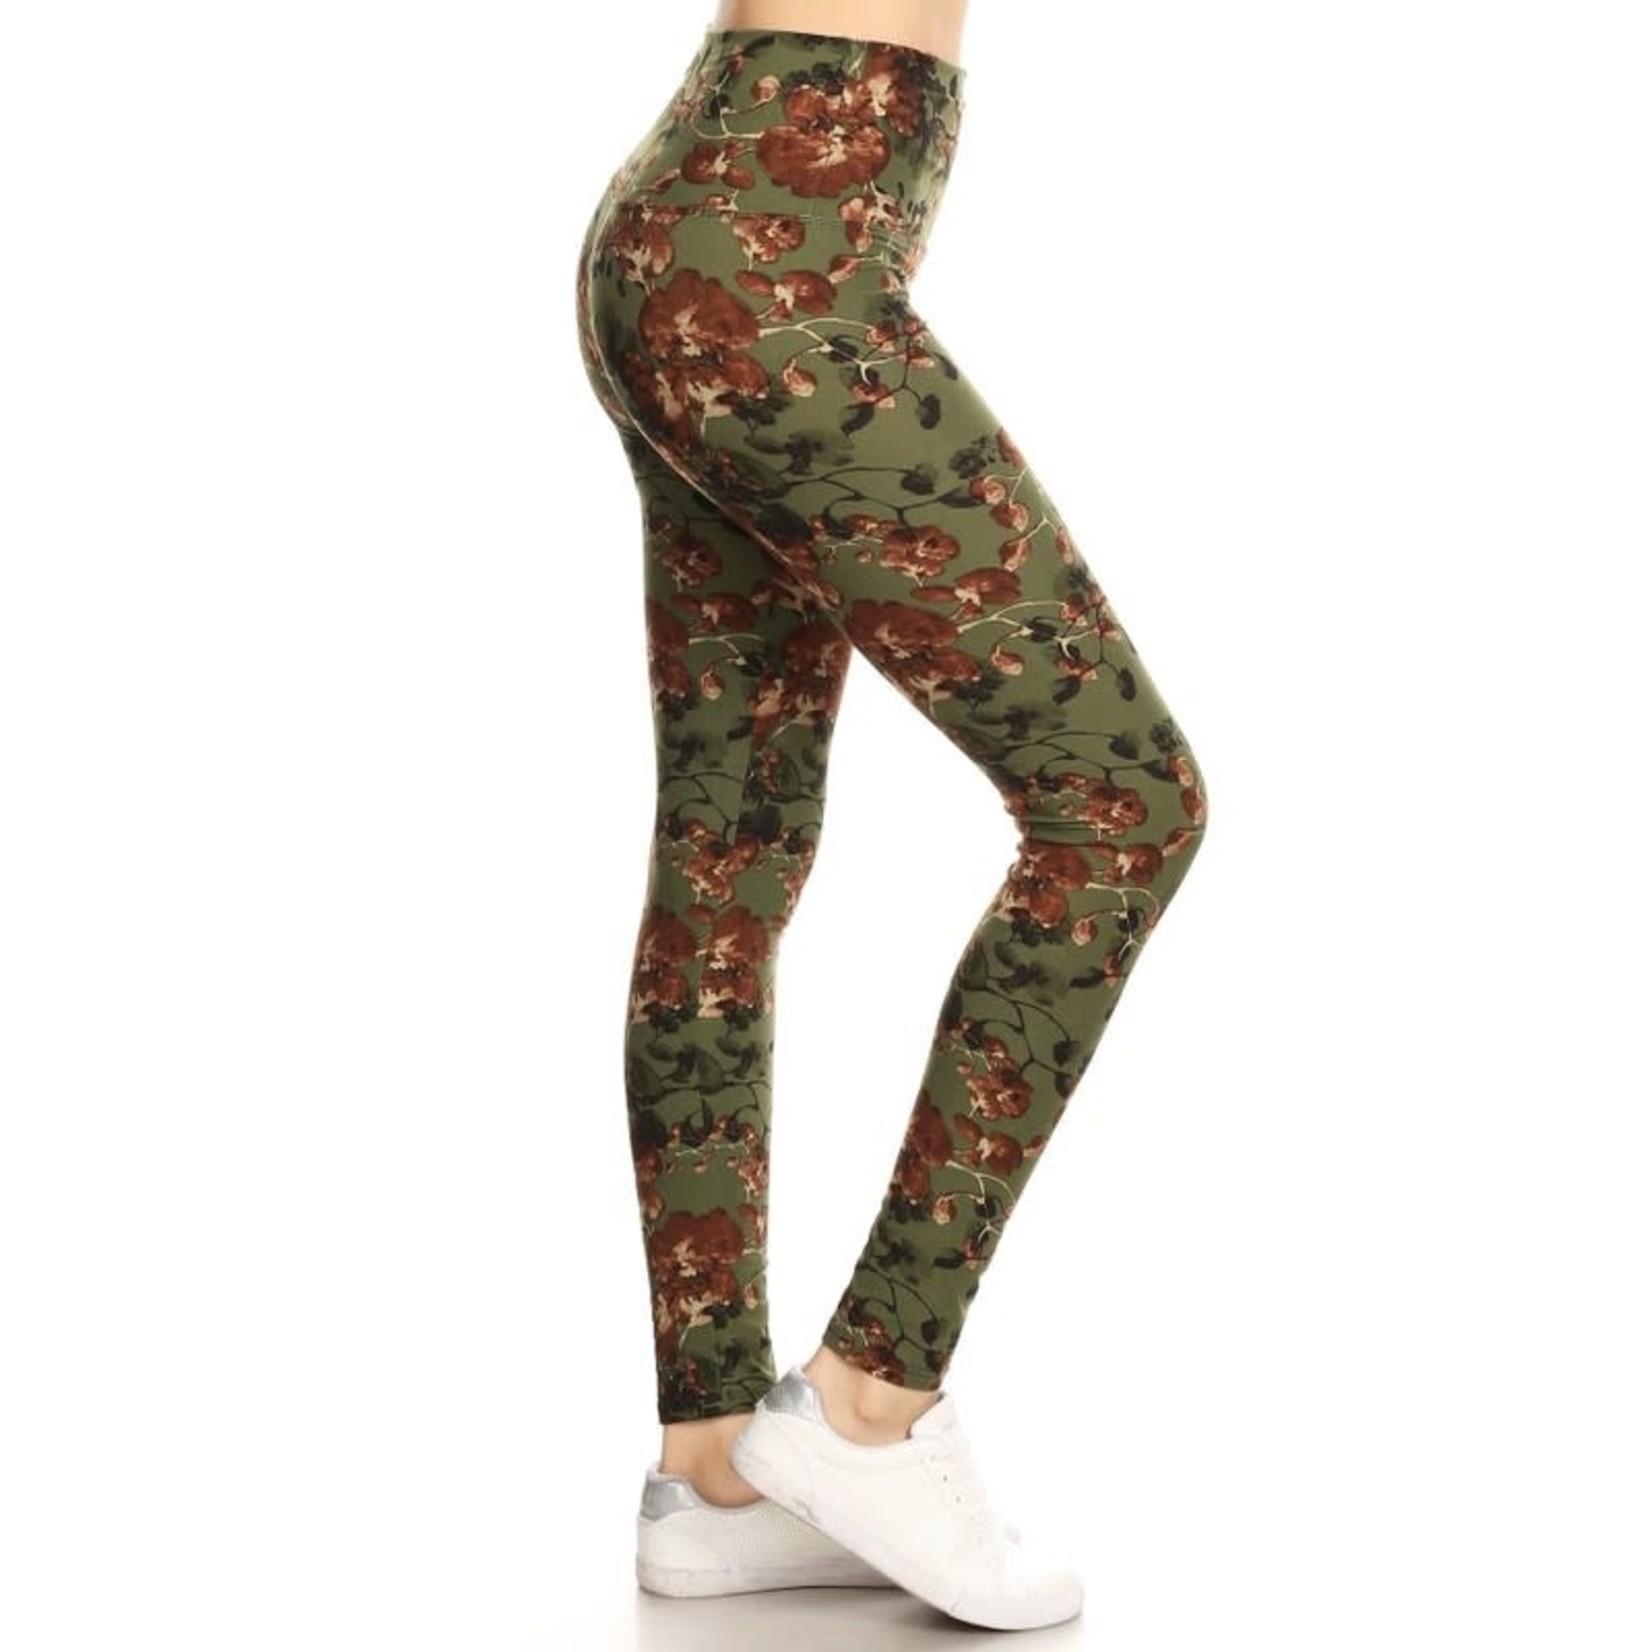 LOVE IT Yoga Olive Floral Leggings